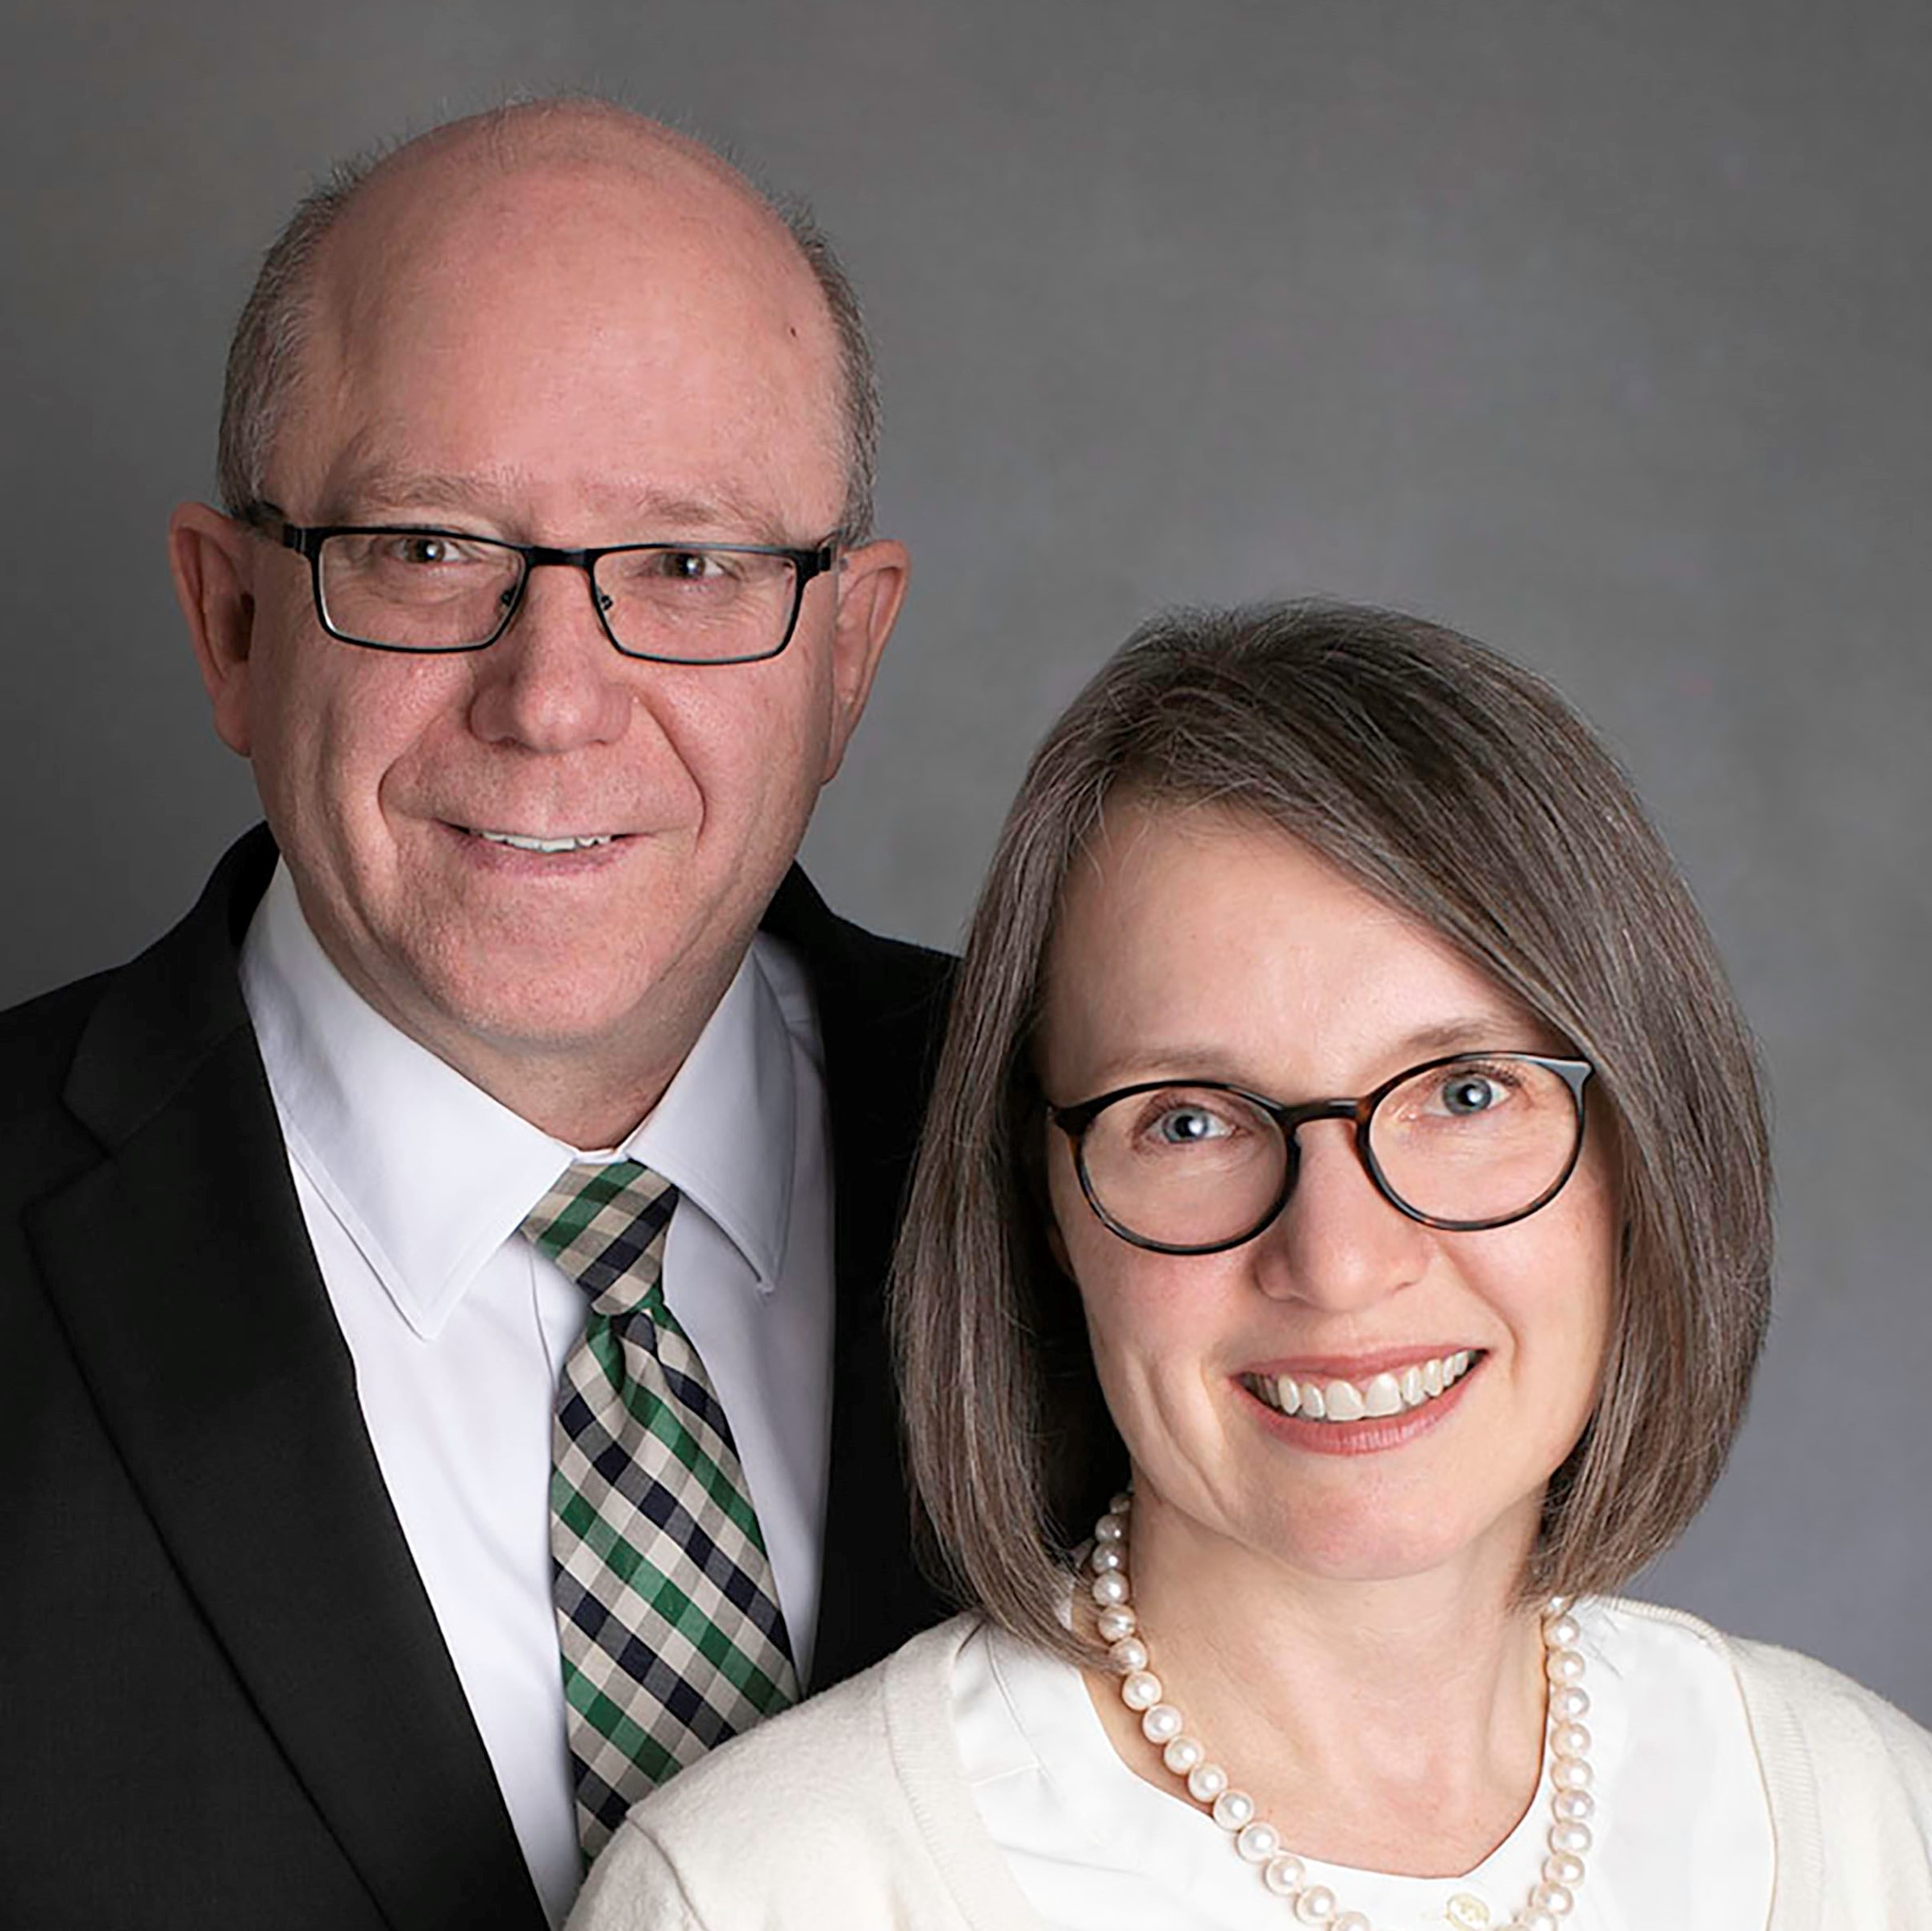 R. Kipp and Donna S. Craig